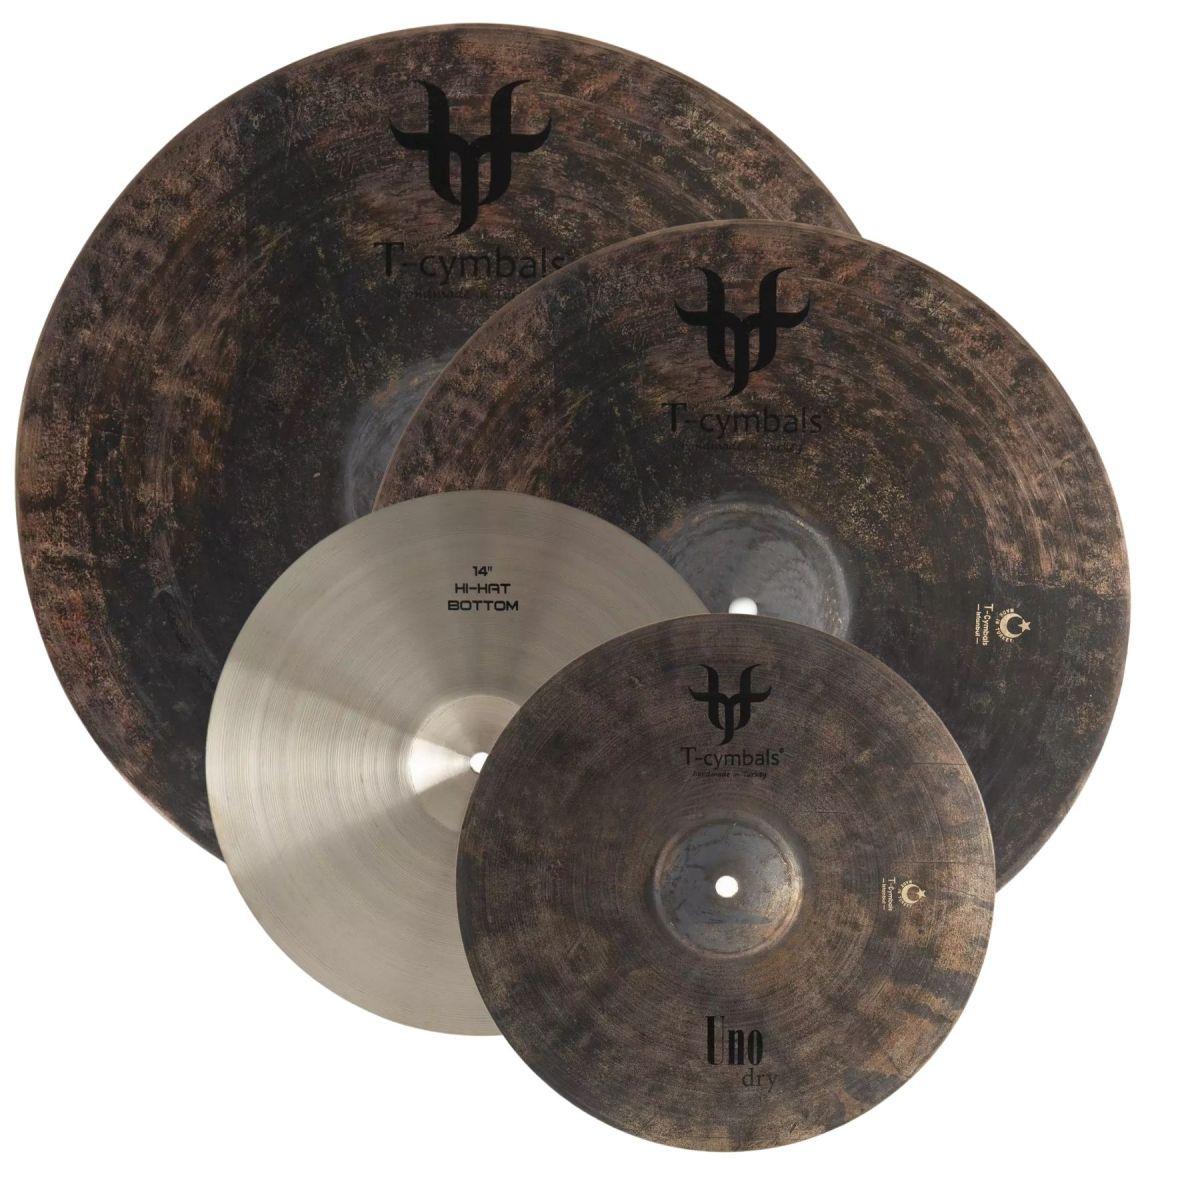 "Set Piatti T-Cymbals UNO DRY HH 14"" Crash 16"" Ride 20"""